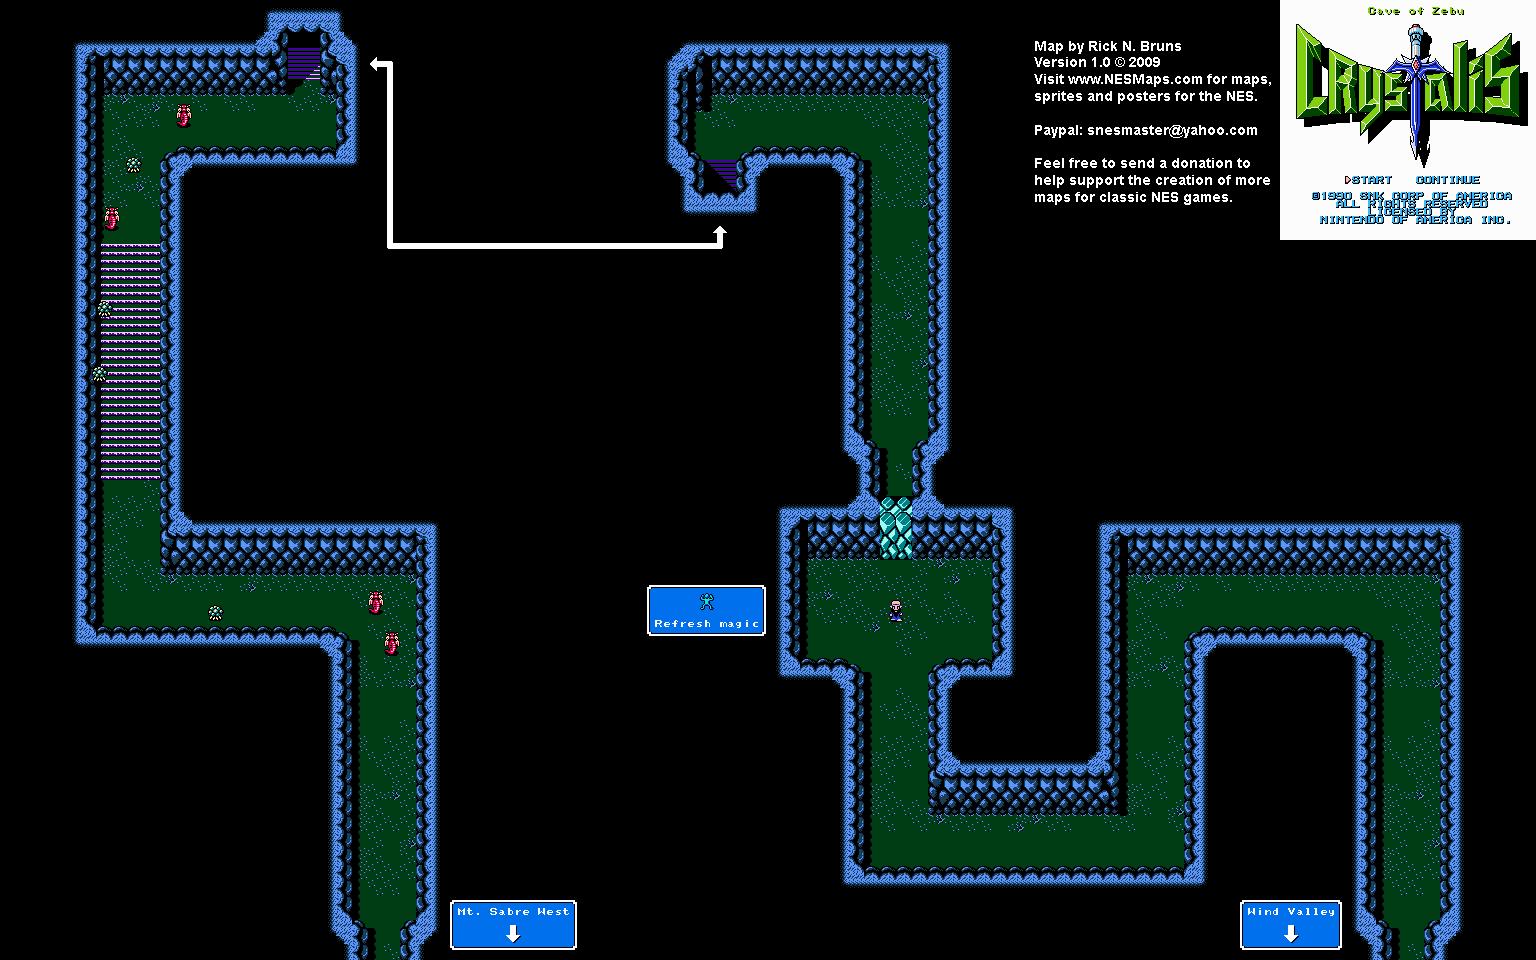 Crystalis - Cave of Zebu Nintendo NES Map: www.nesmaps.com/maps/Crystalis/CrystalisMap03.html